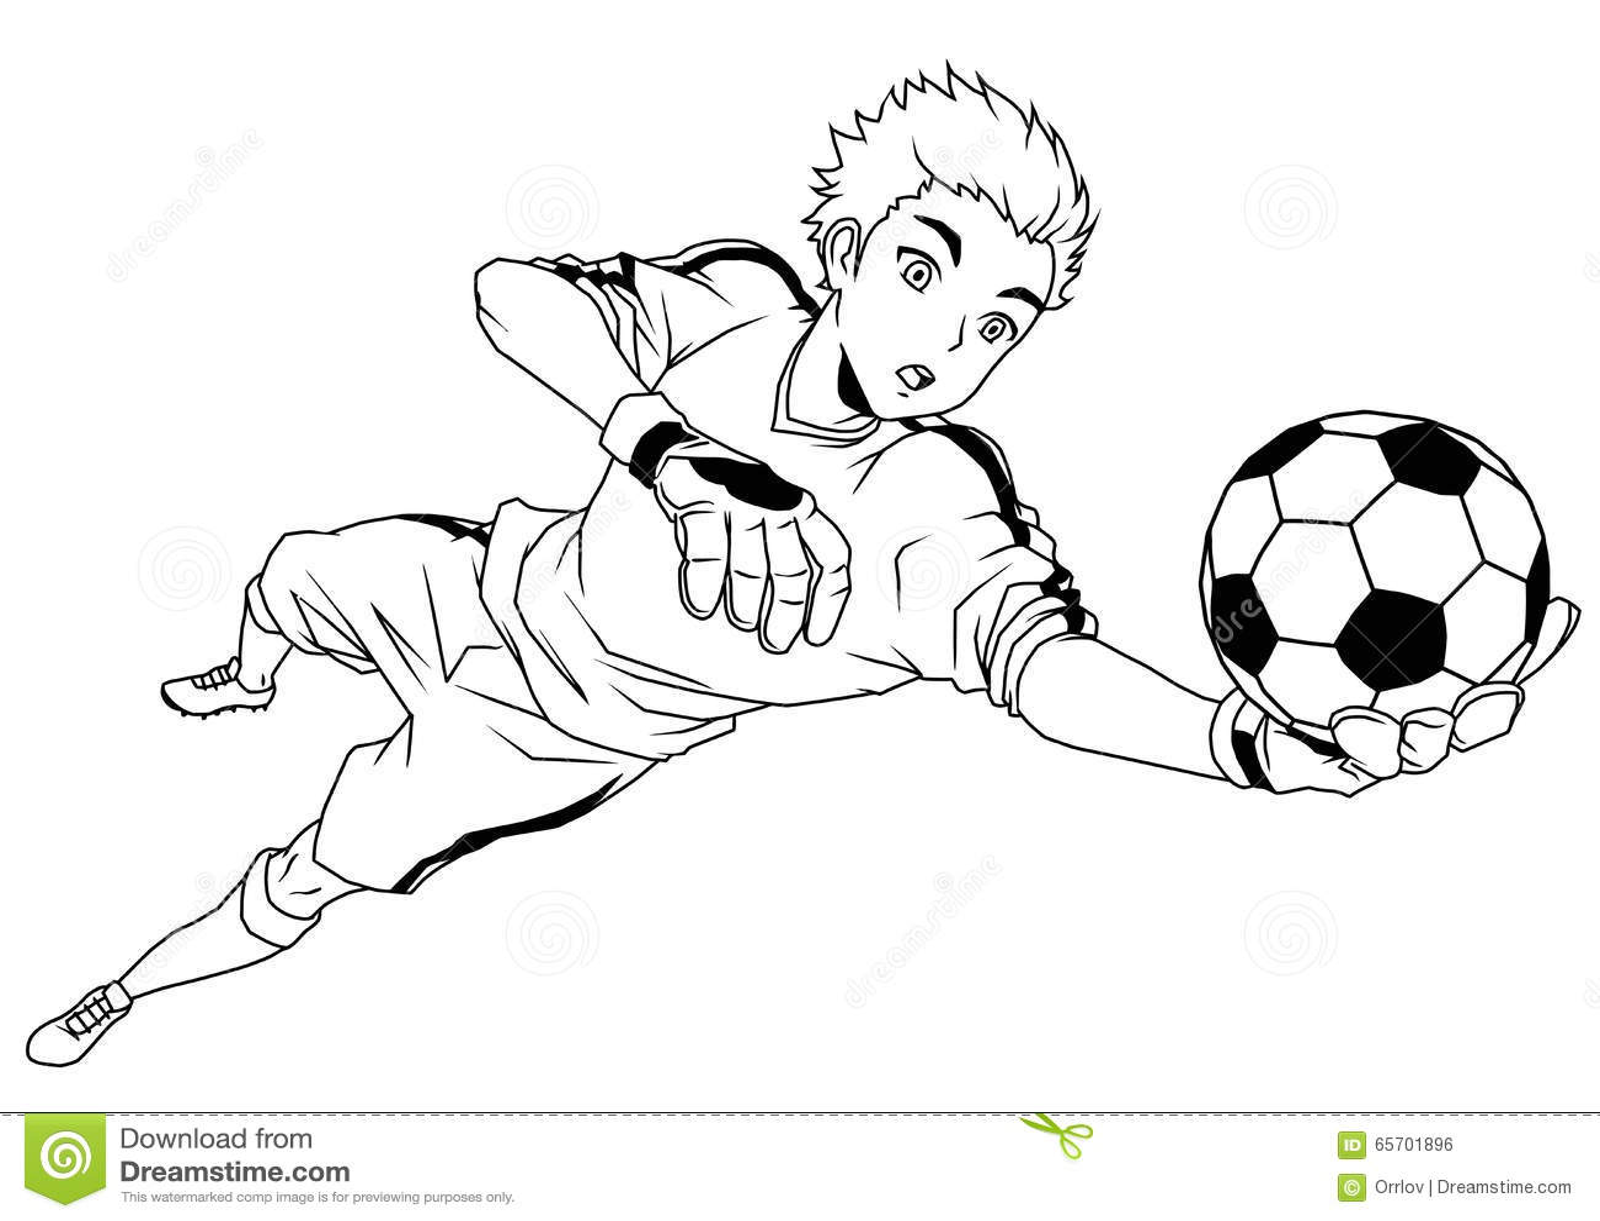 вратарь ловит пенчингбол  перчатками